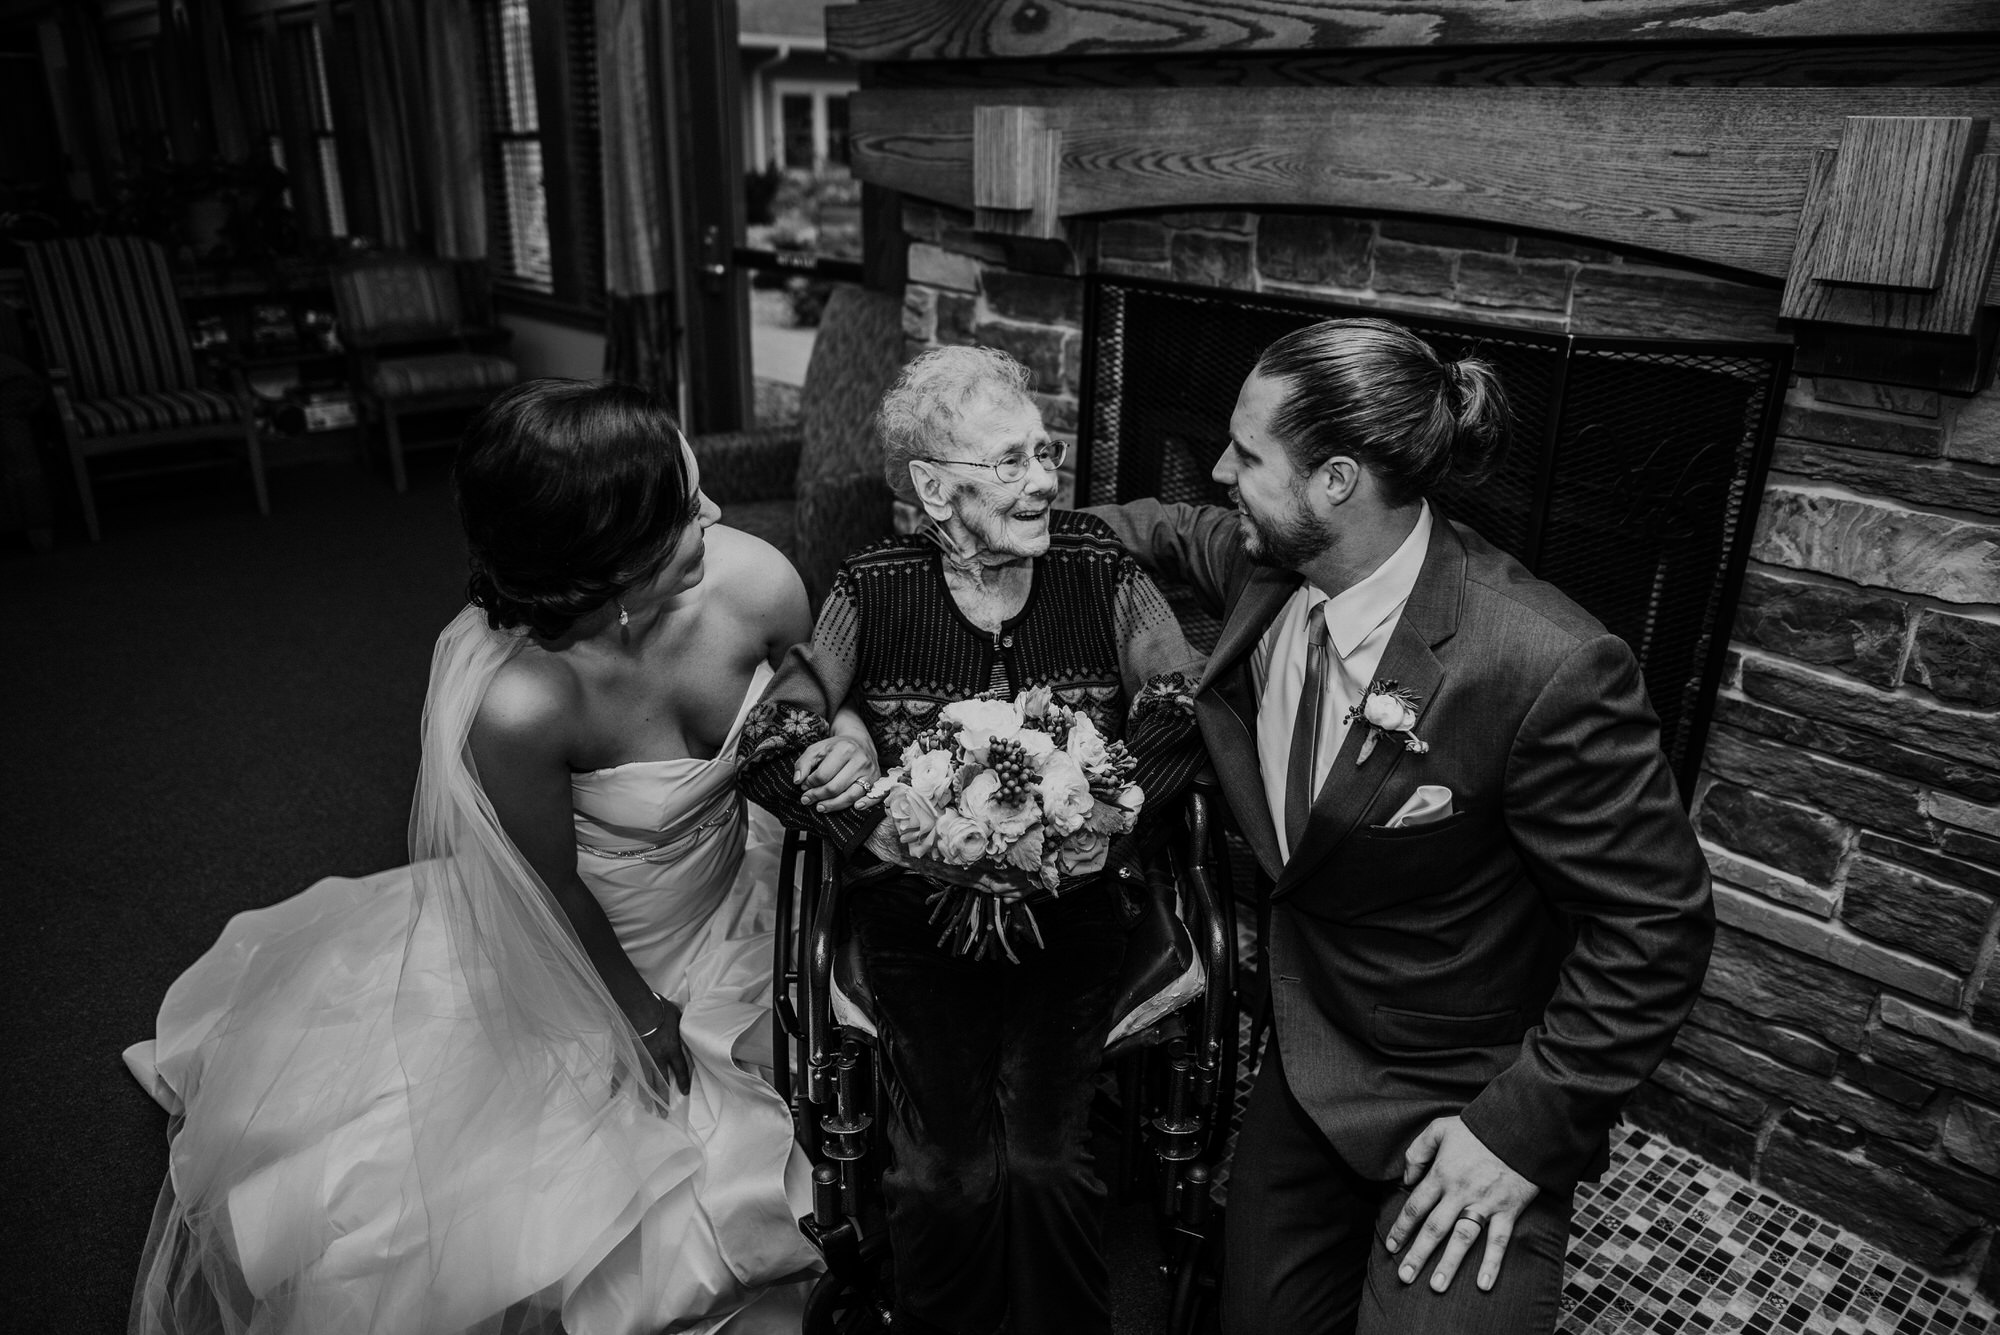 Kaylie_Sirek_Photography_Grand_Island_Kearney_Hastings_Lincoln_Nebraska_Wedding_Engagement_Grandma_Grandparent_Delray_Downtown_DowntownLincoln_LNK_Emotional_Bride_Groom_Photographer_42.jpg